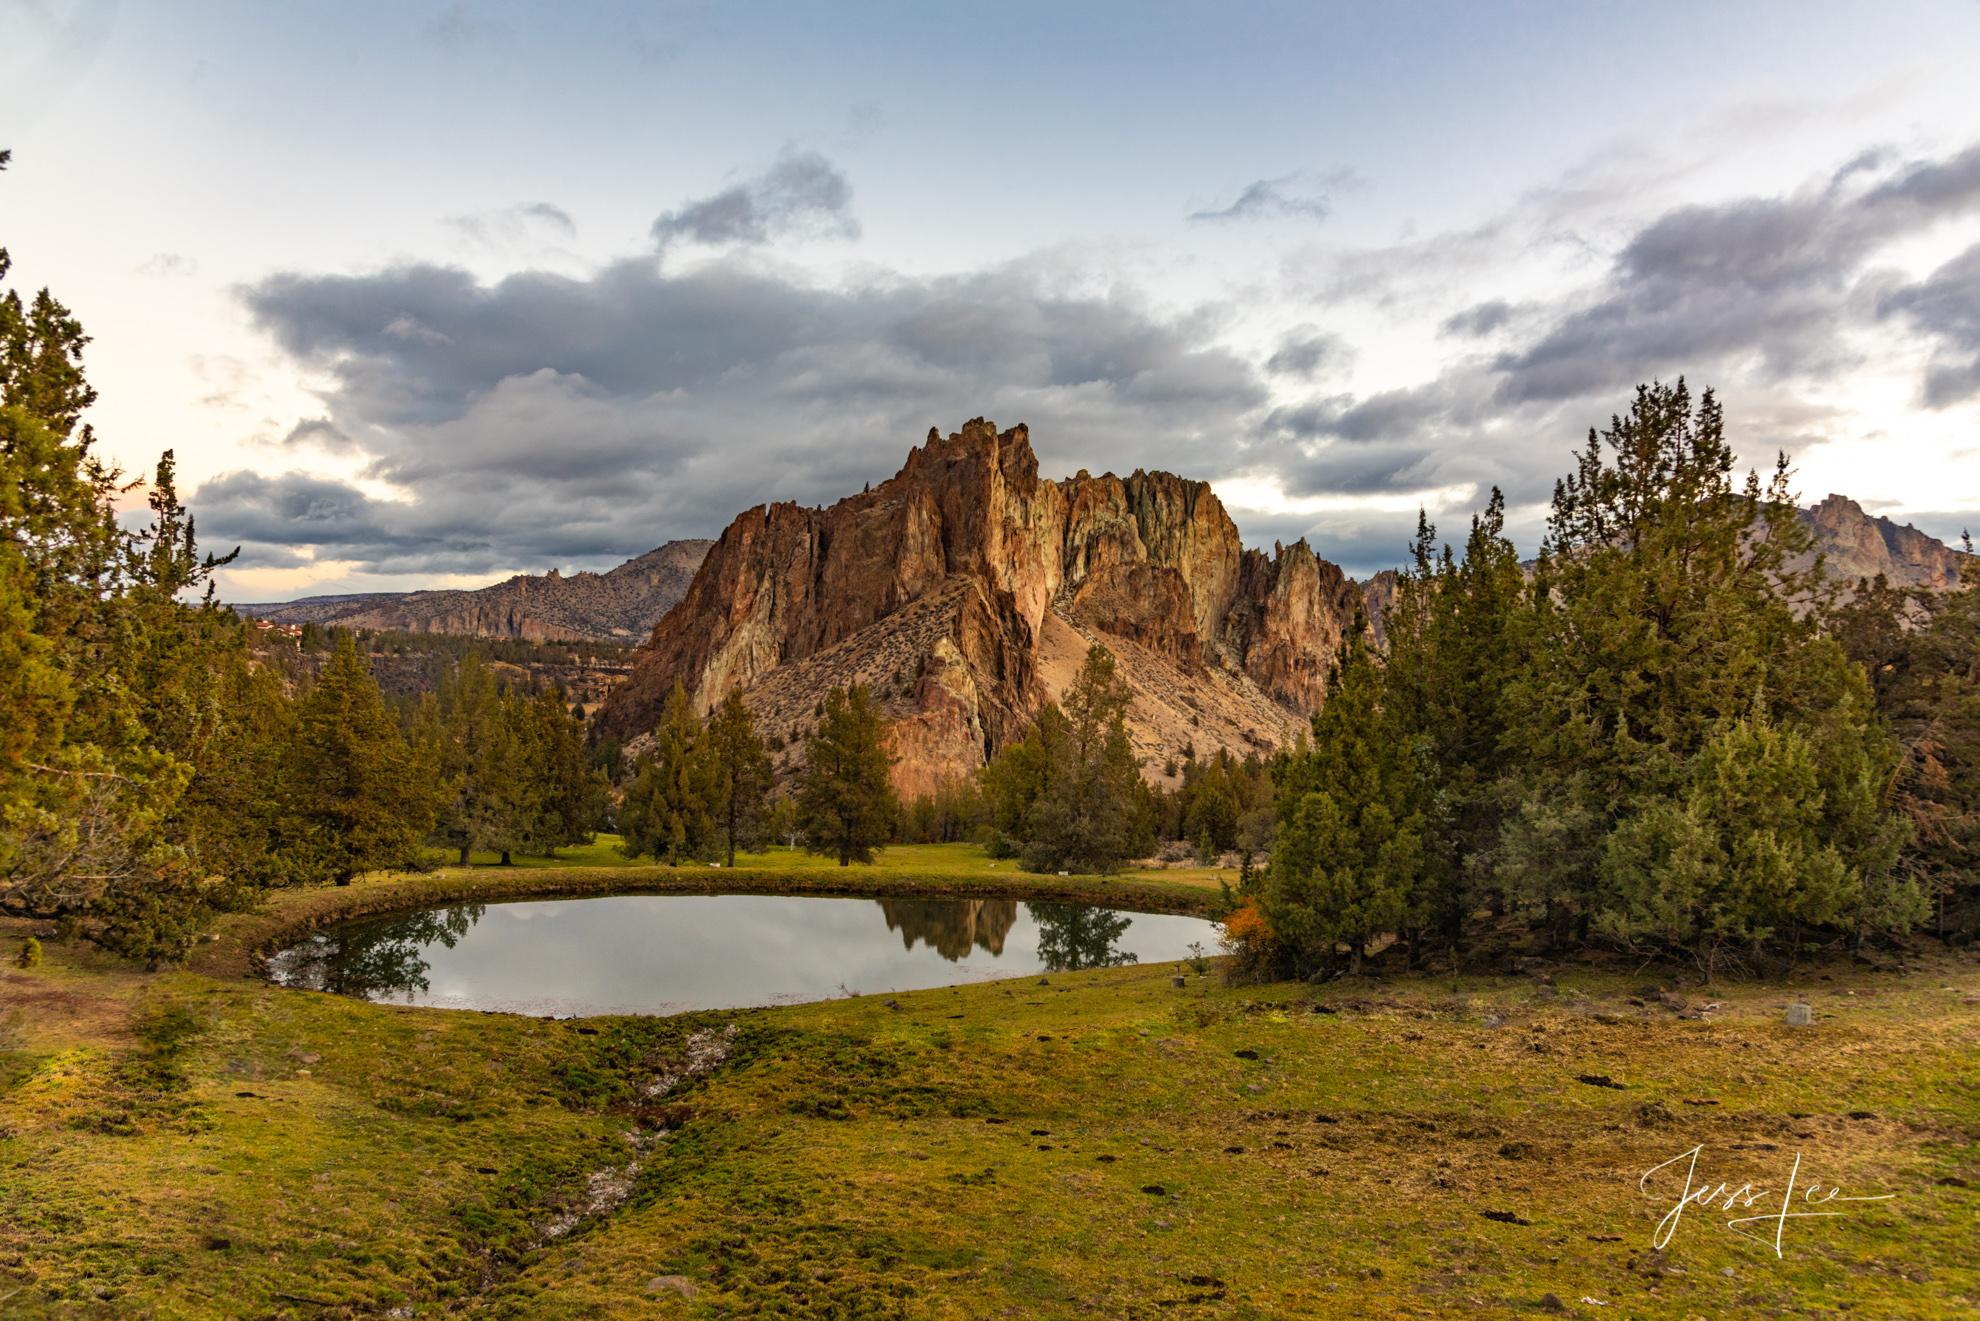 landscape photography, Large format, quality, museum, fine art, print, jess lee, artist, western, cowboy, photographer, limited...